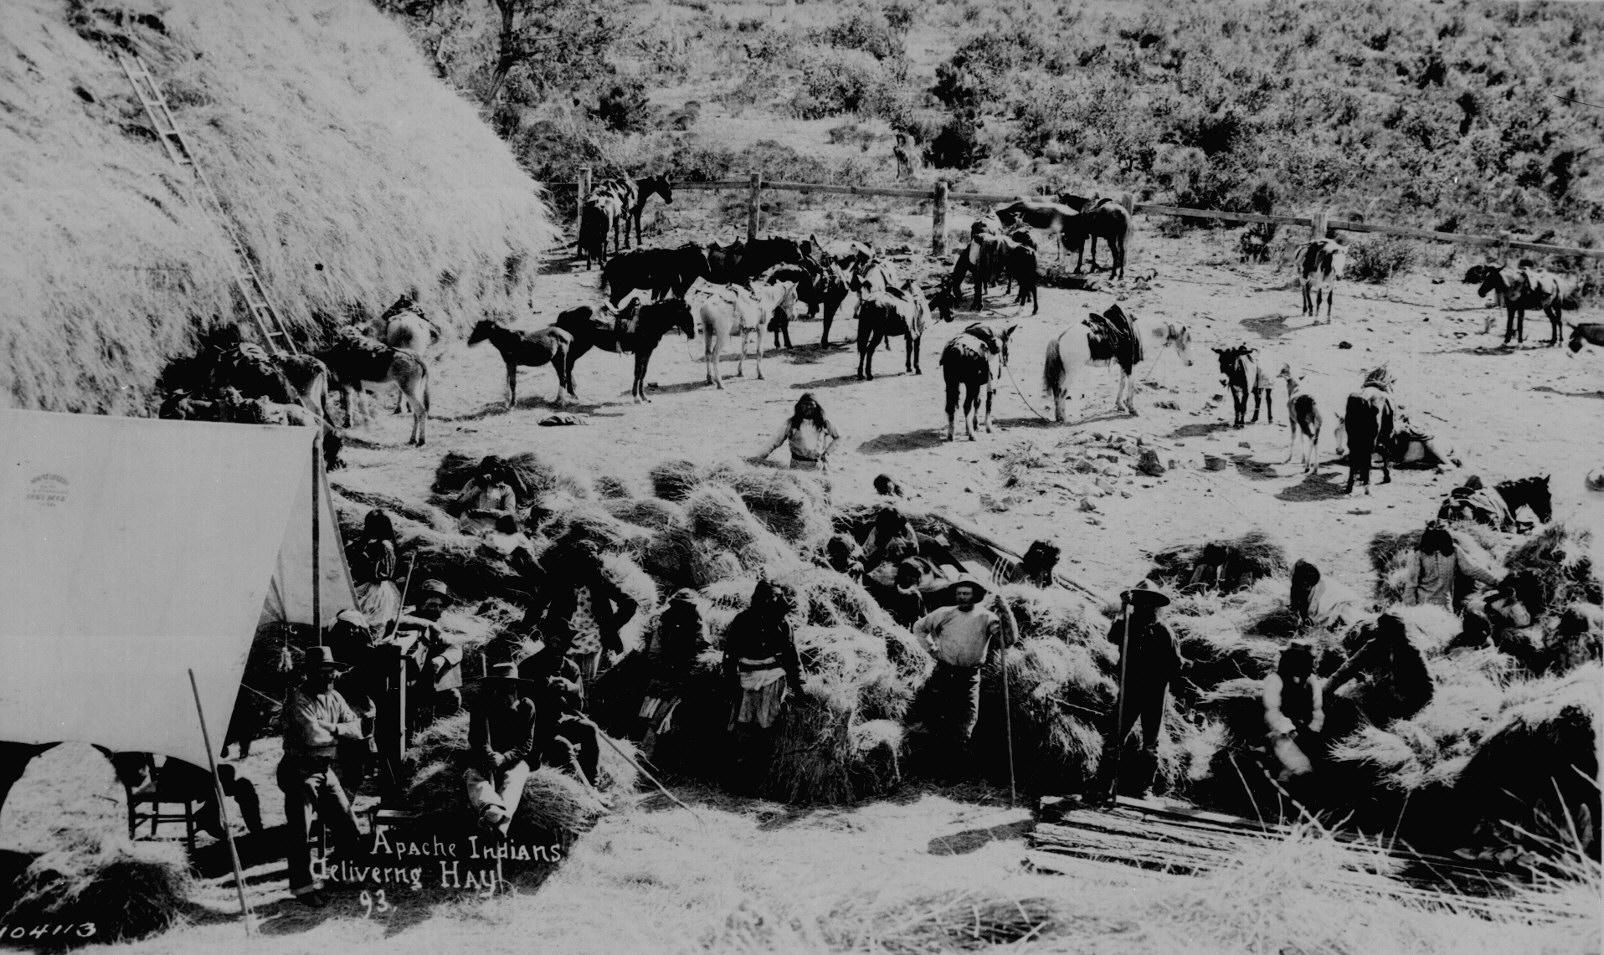 75 apache indians delivering hay fort apache ariz 1893 111